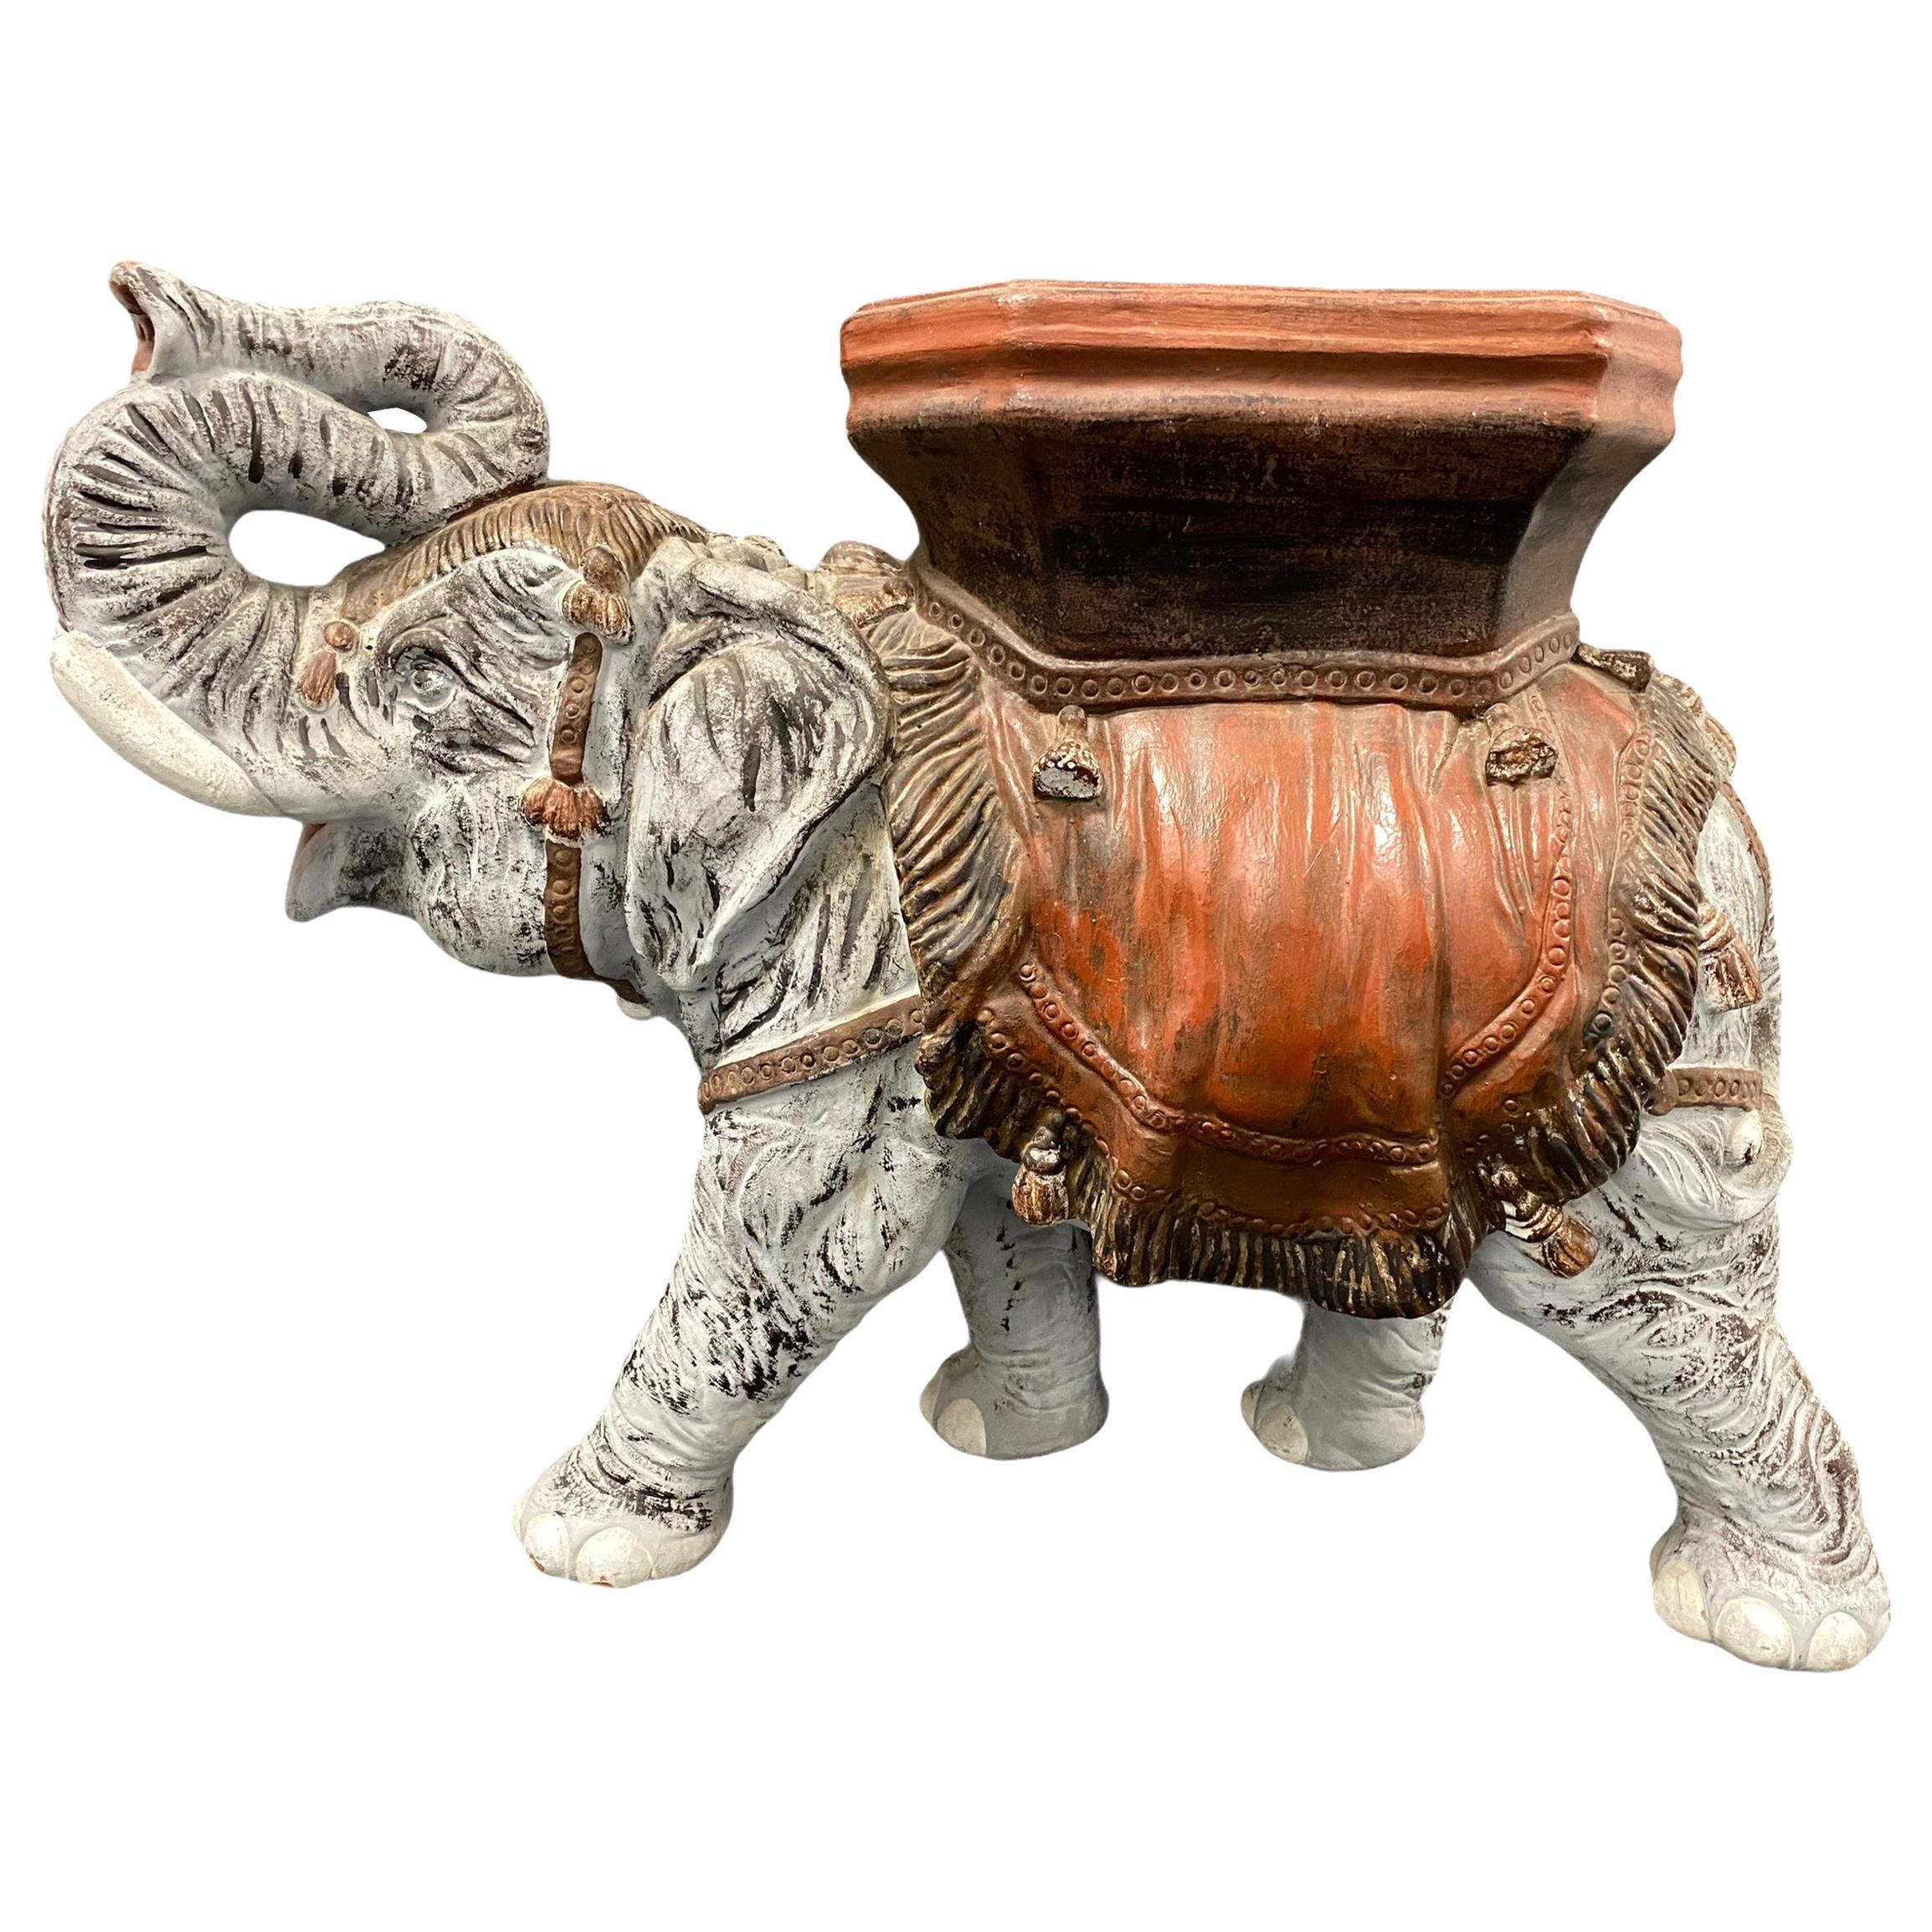 Hollywood Regency Italian Terracotta Elephant Garden Stool Plant Stand or Seat